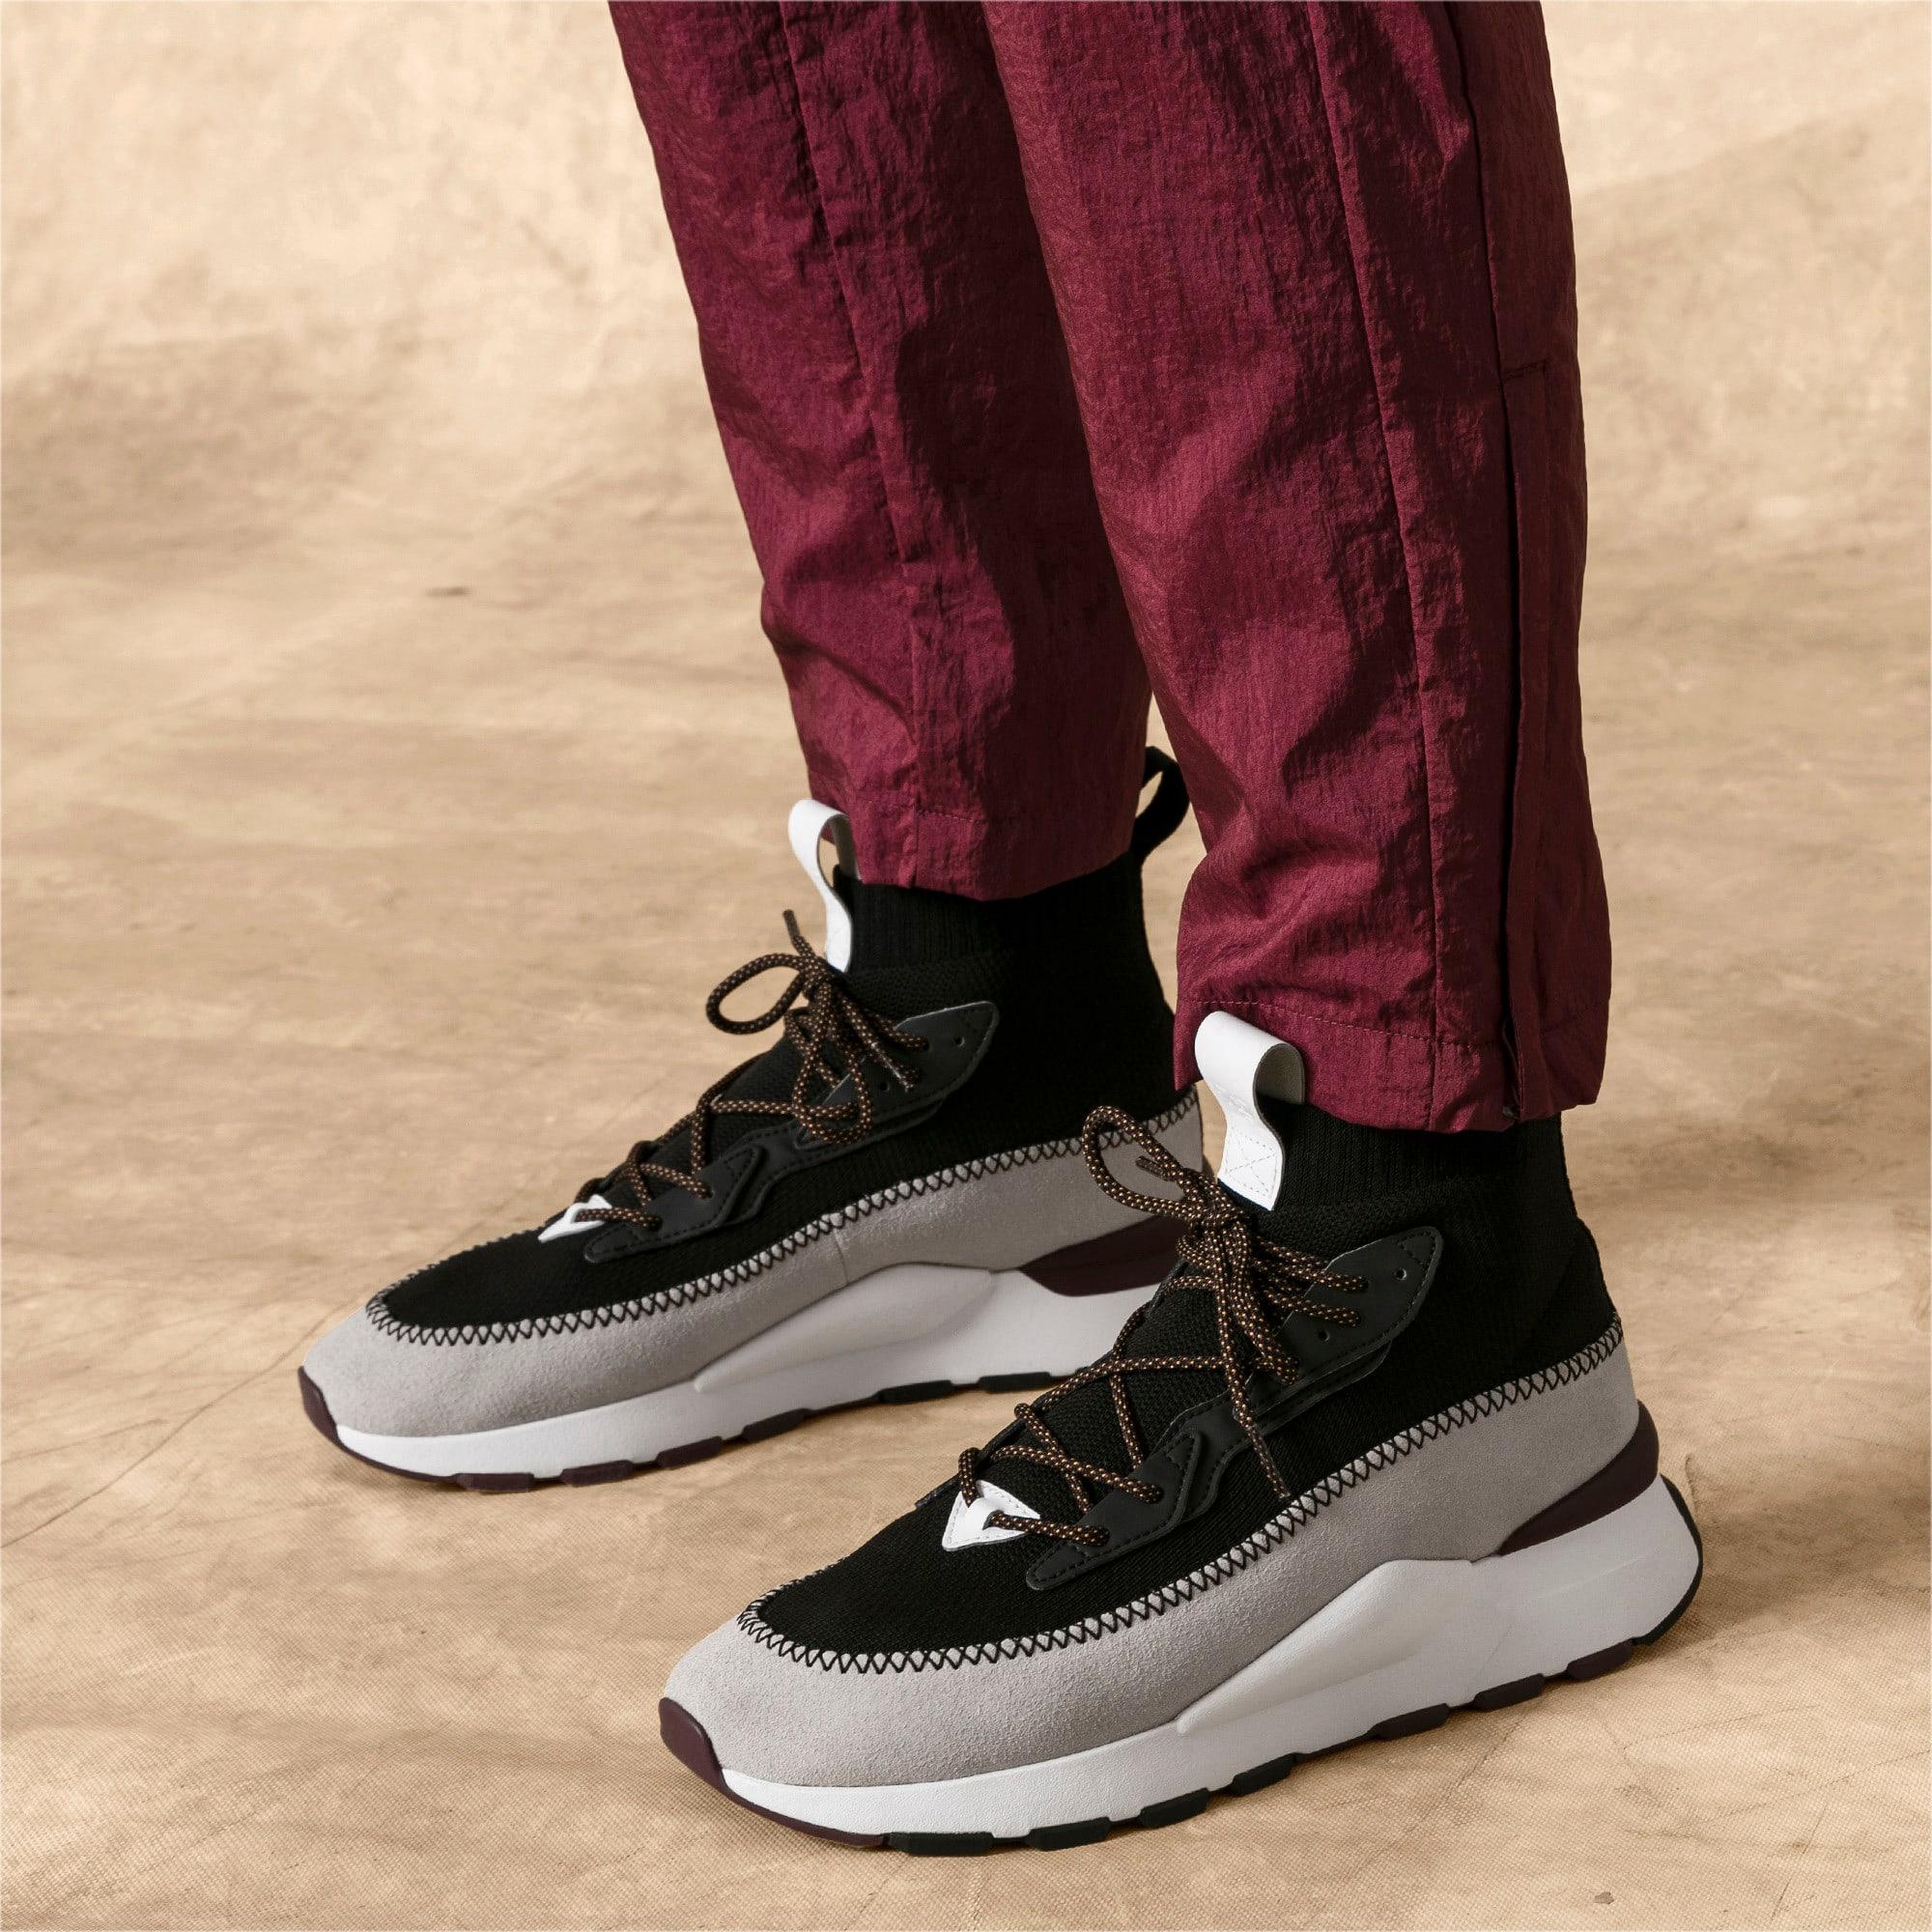 Thumbnail 2 of RS-0 LES BENJAMINS Sneakers, Puma White-Puma Black, medium